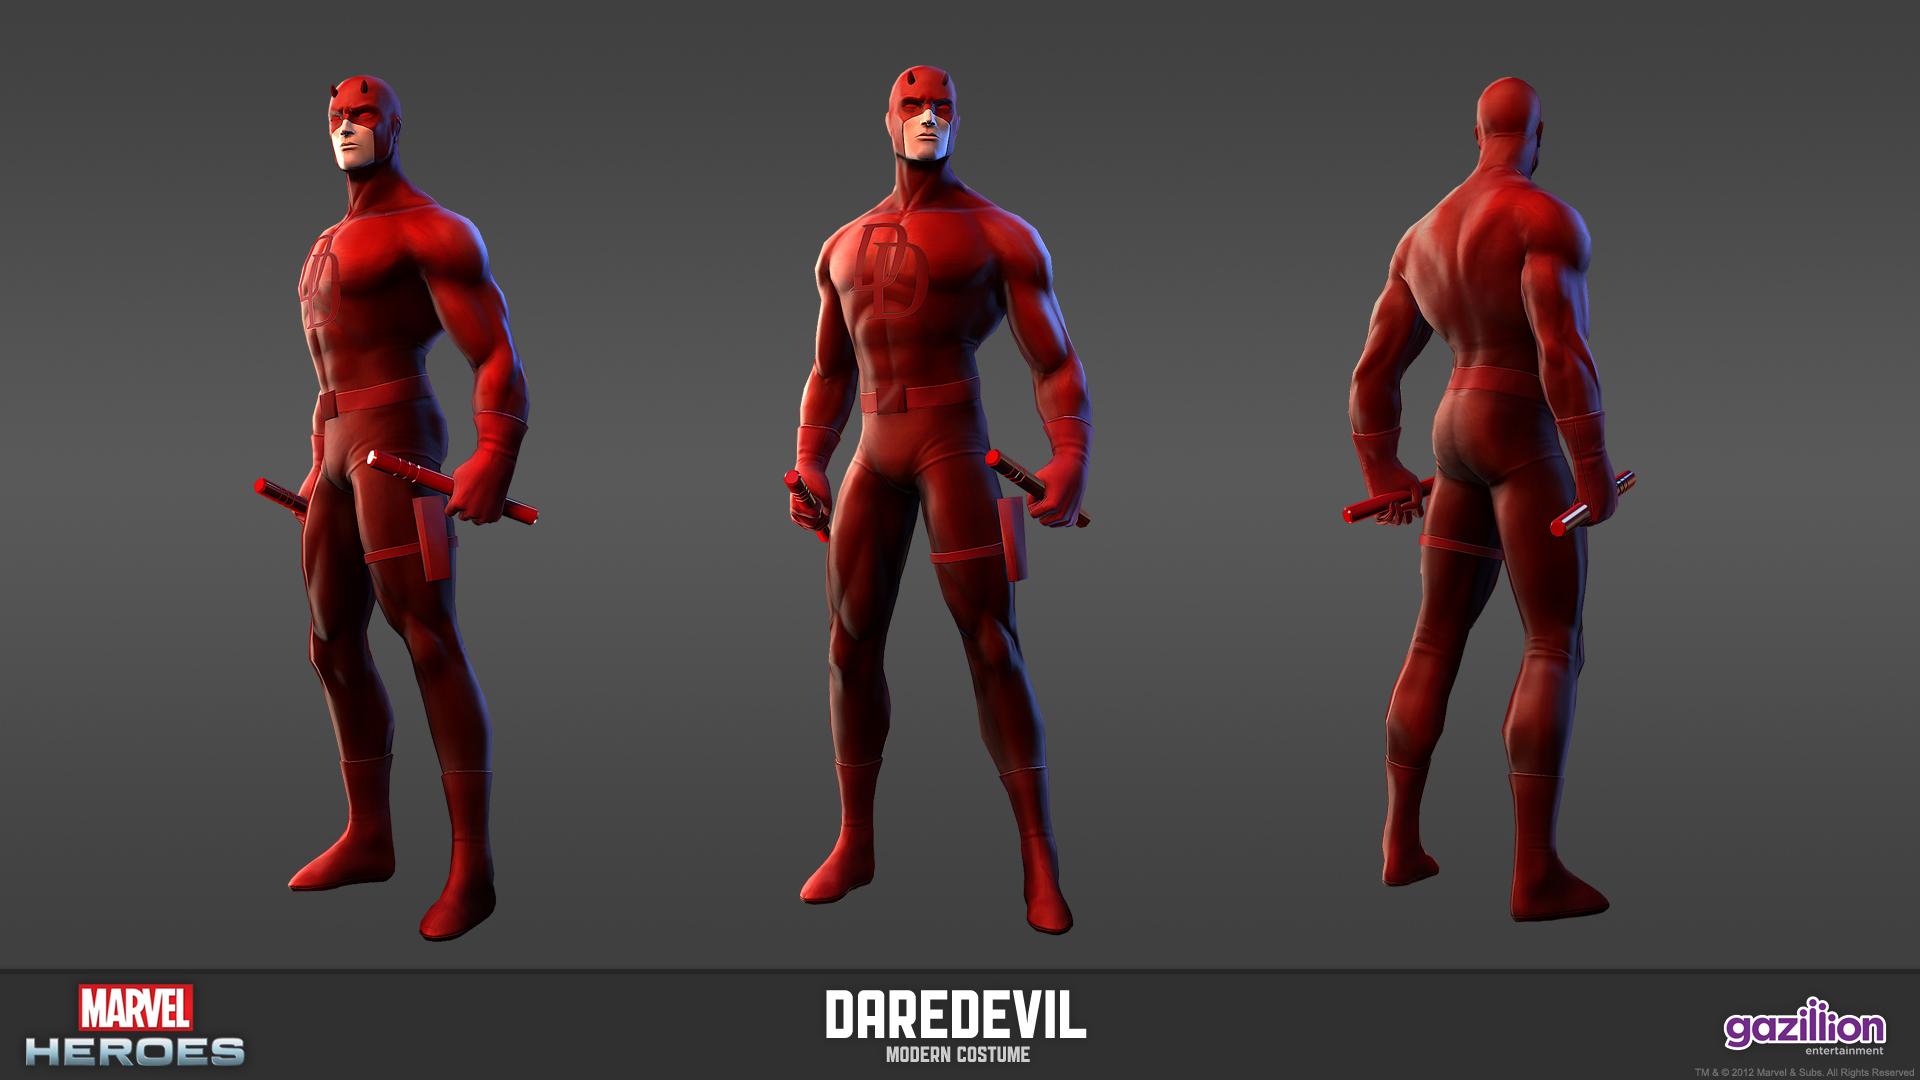 Marvel heroes daredevil 001